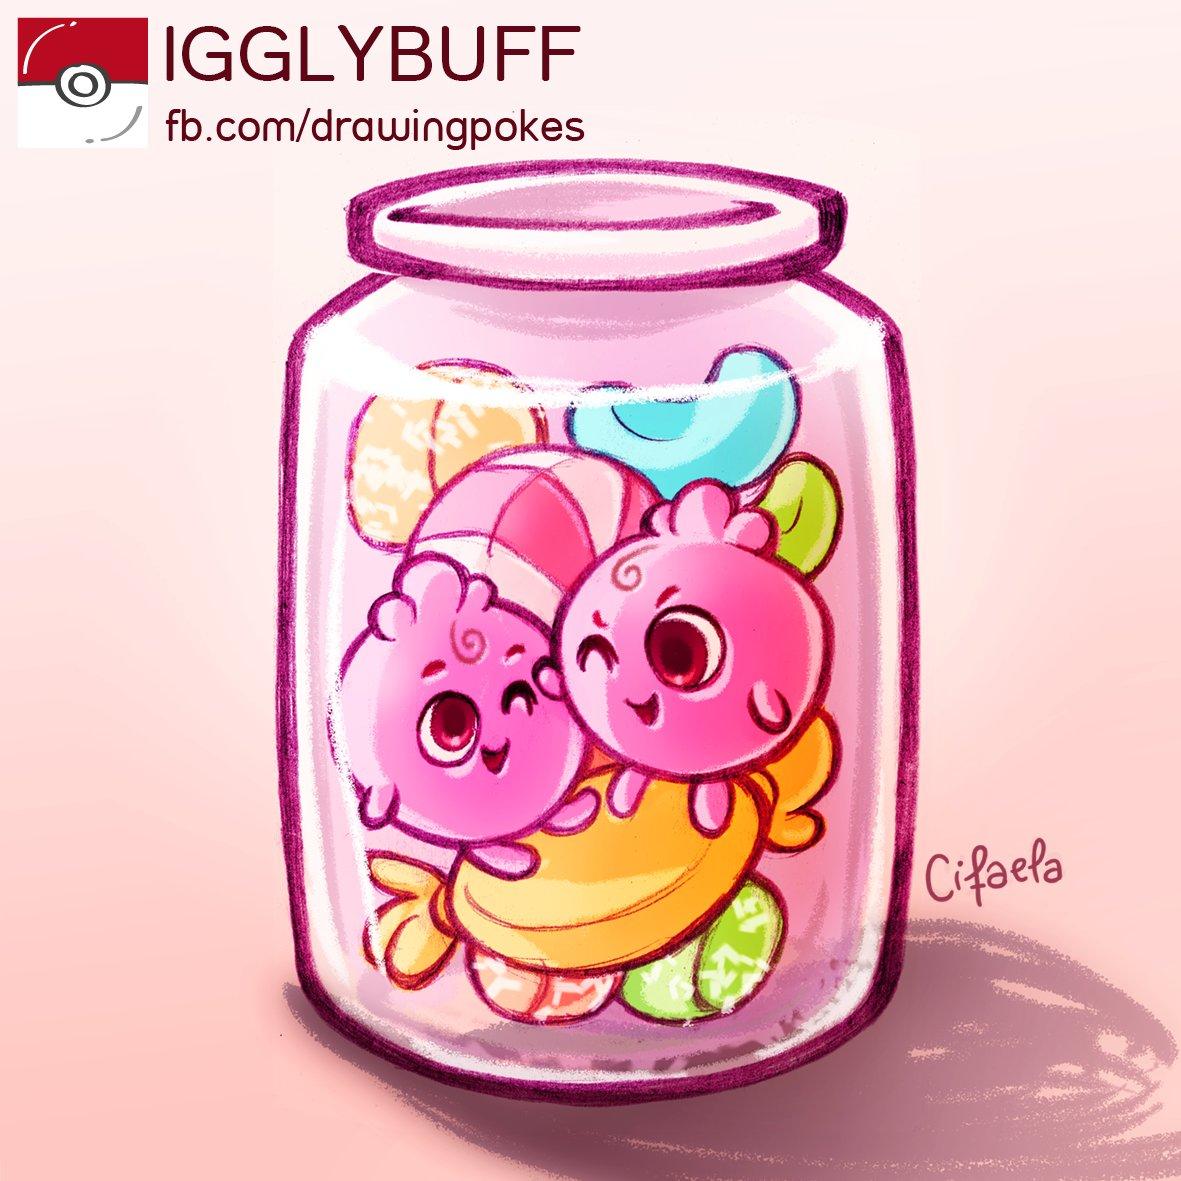 Fabiola monteiro igglybuffl